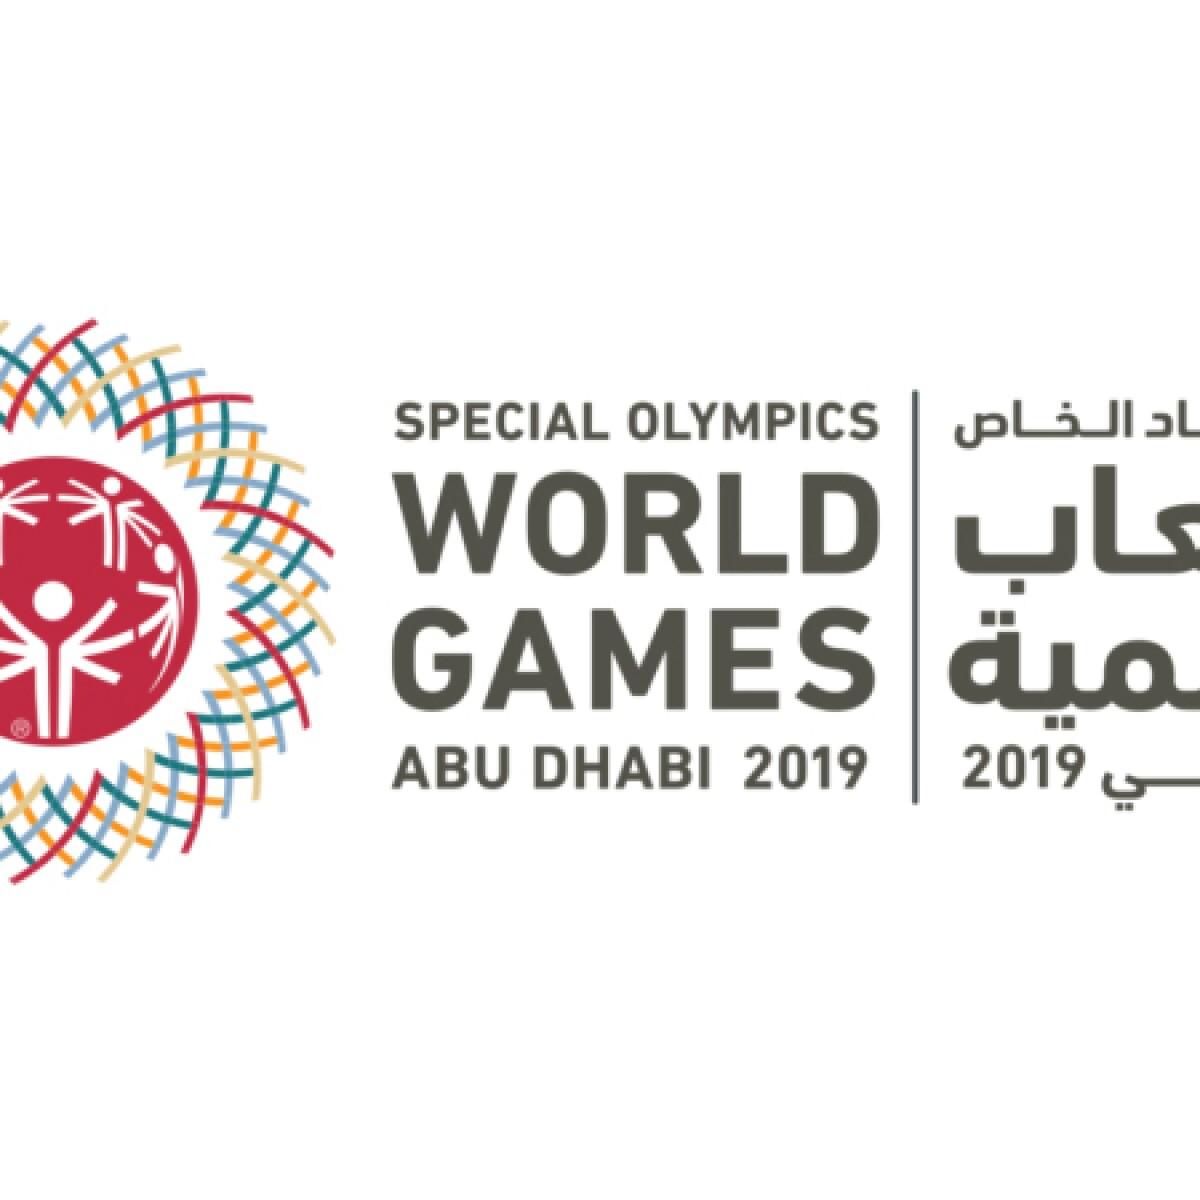 ESPN announces World Games 2019 coverage